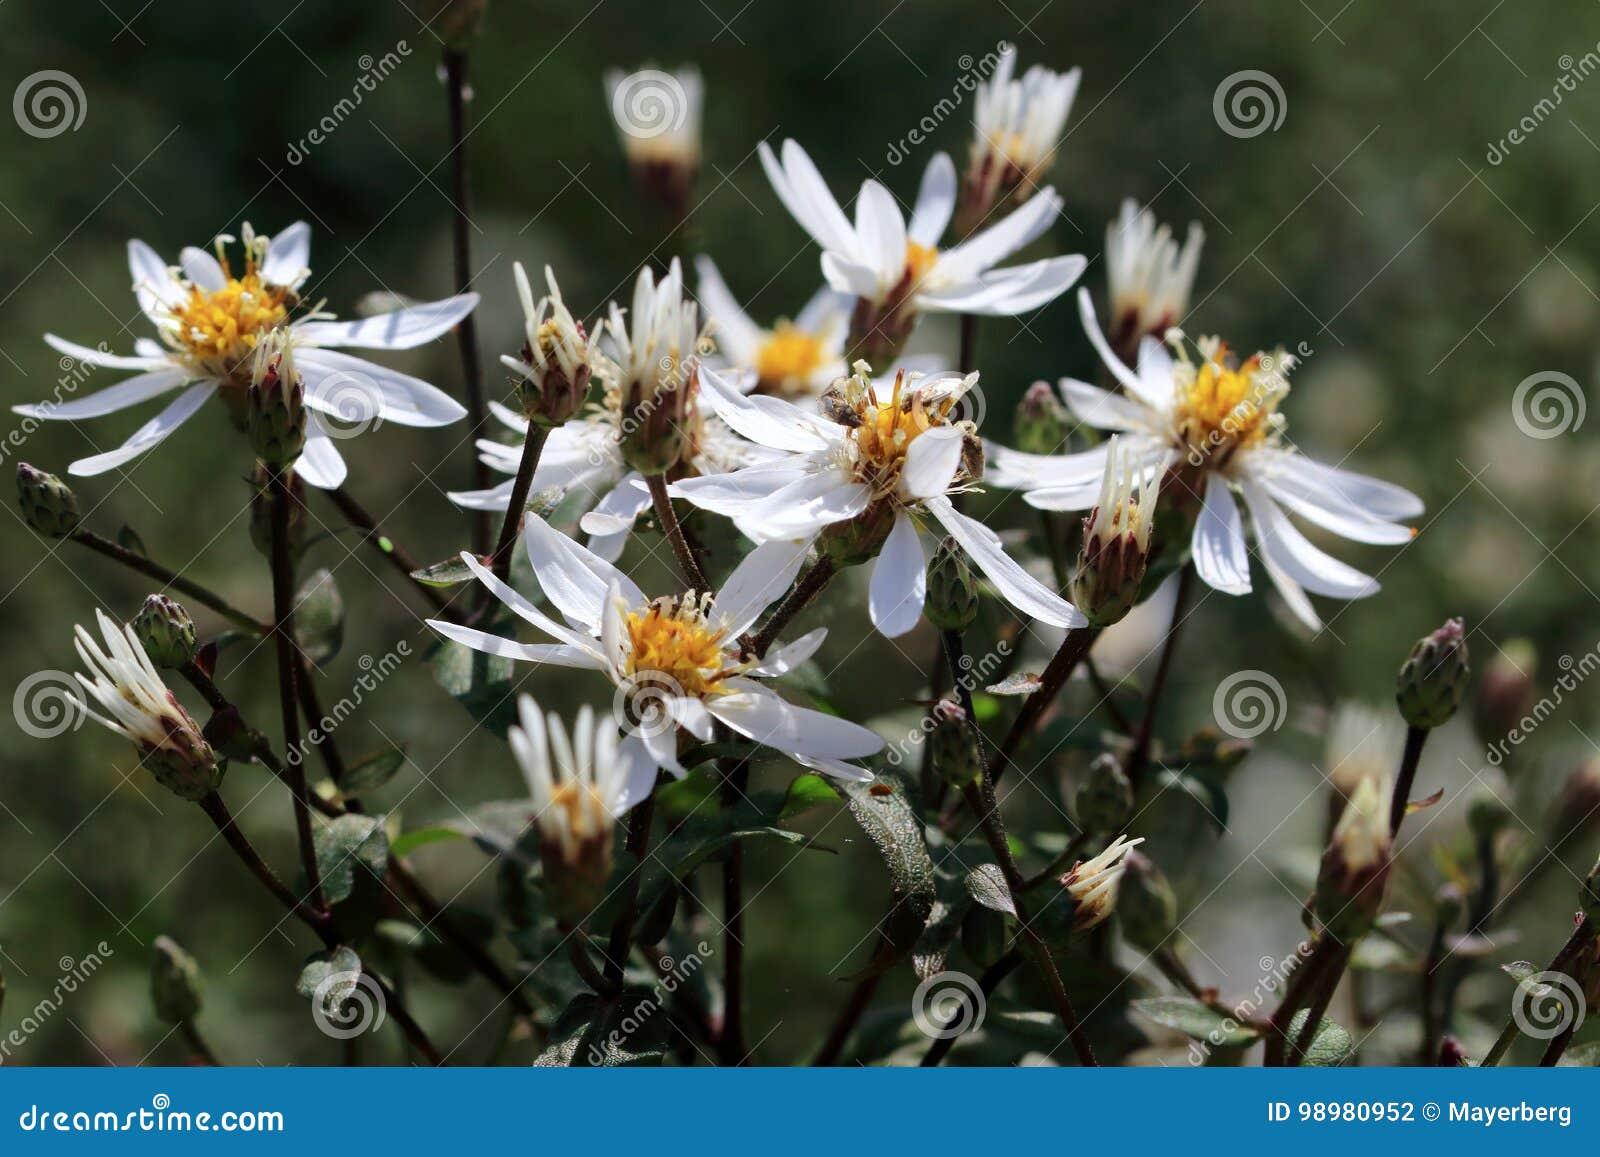 White Star Shaped Flowers Of Aster Divaricatus Stock Photo Image